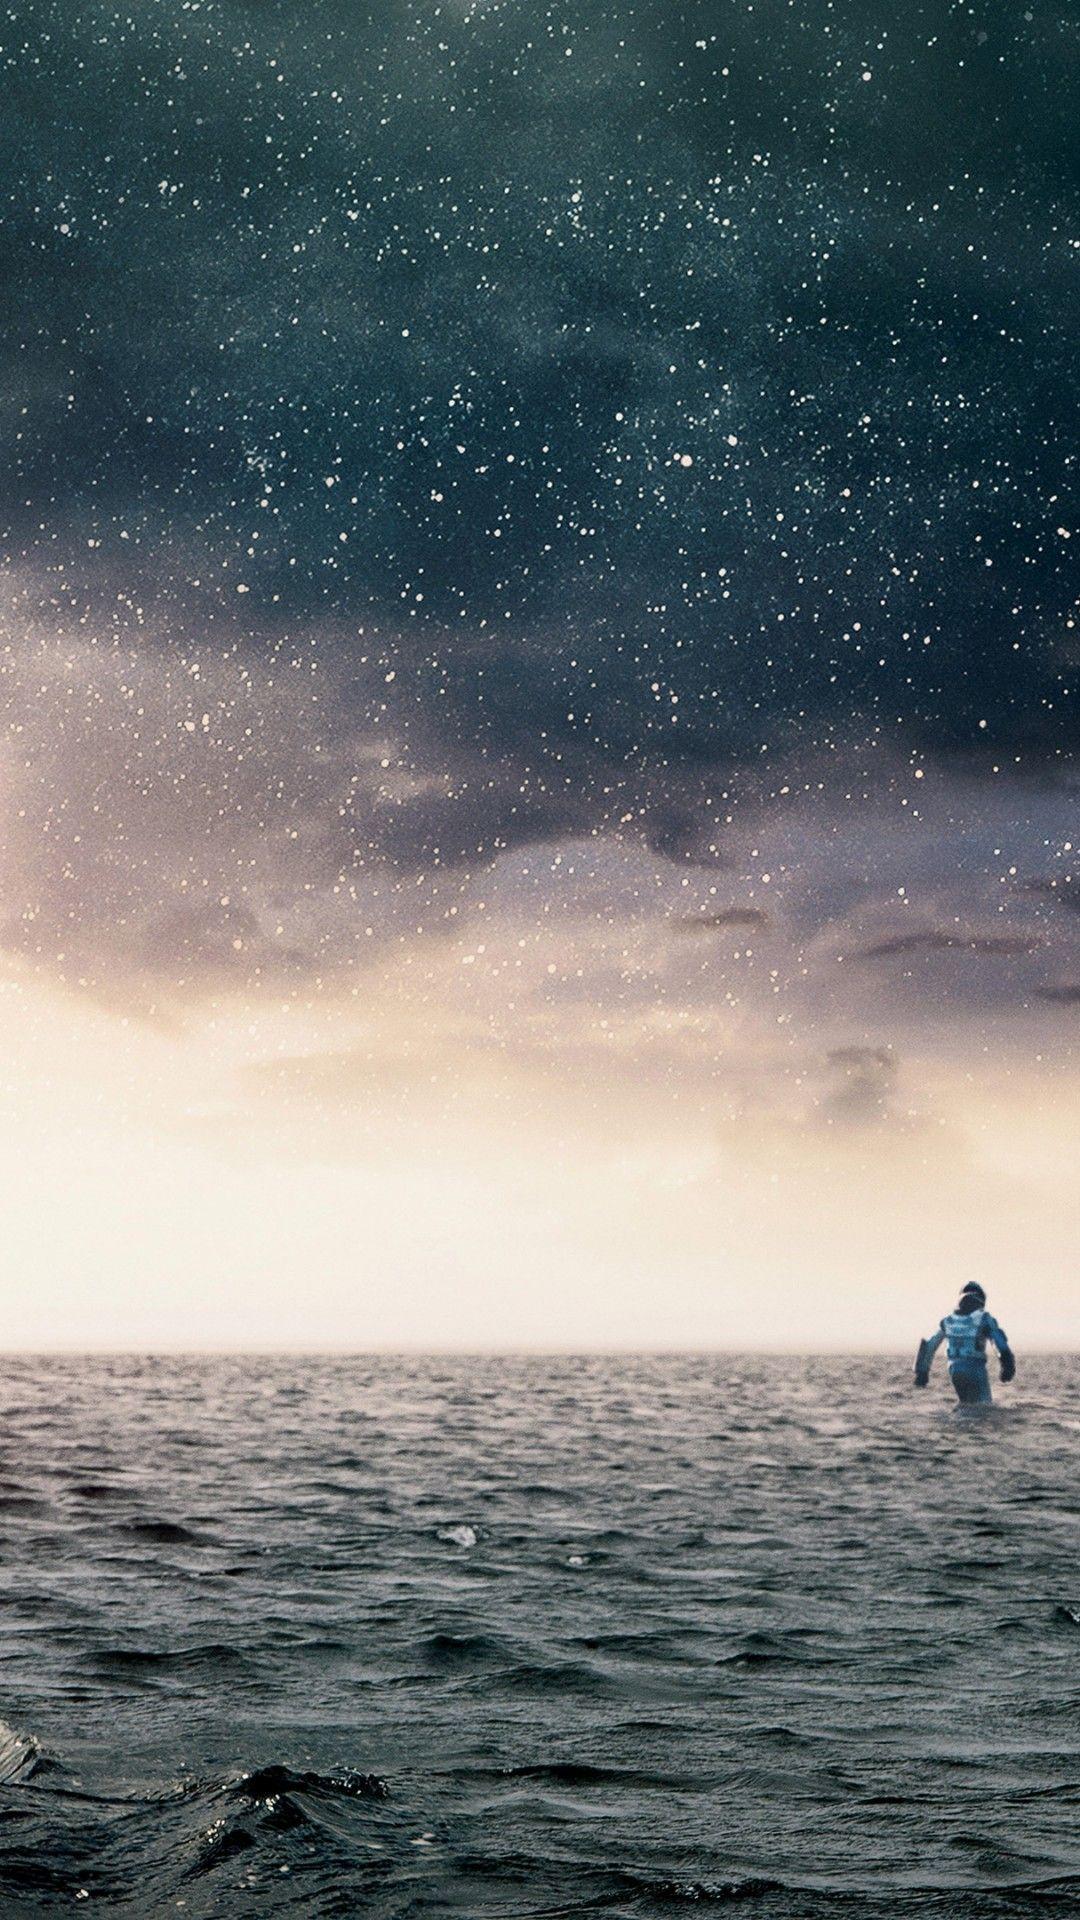 4k Interstellar Wallpapers In 2020 Interstellar Posters Interstellar Interstellar Movie